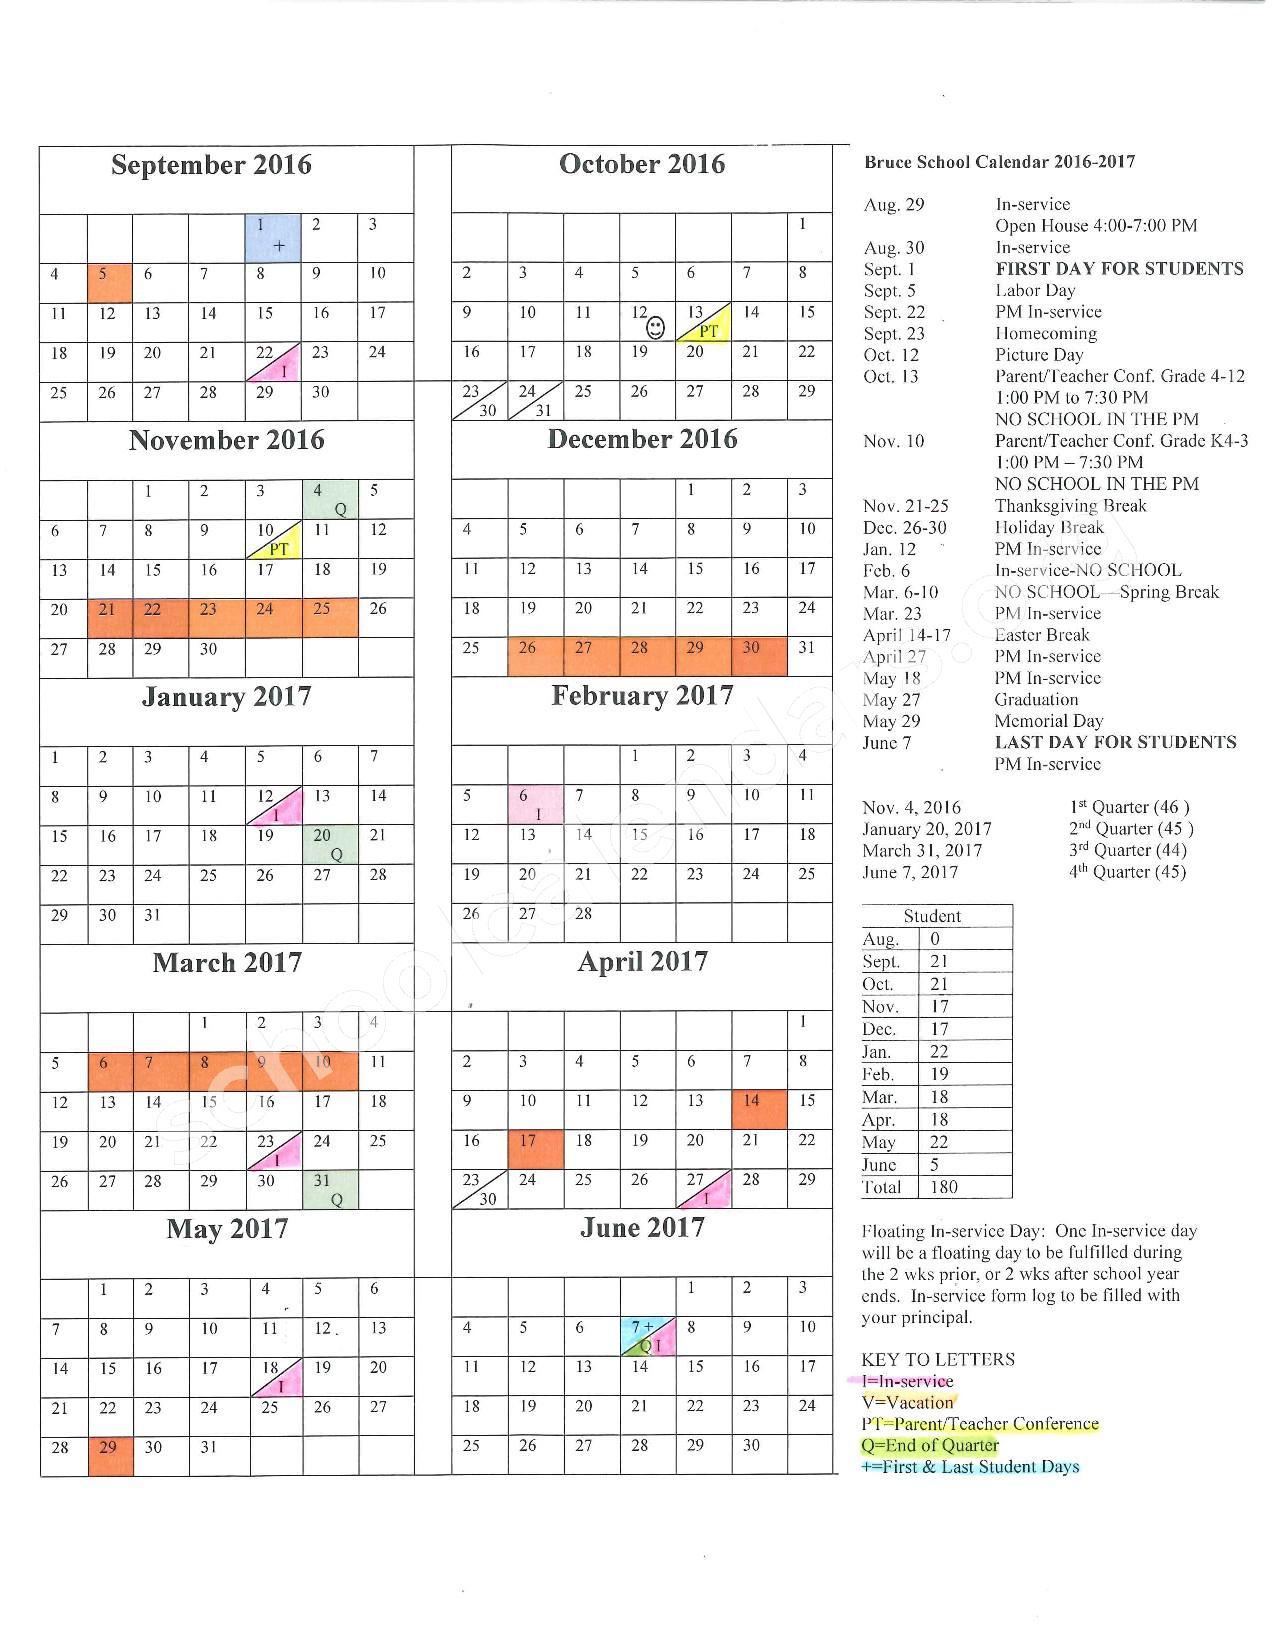 2016 - 2017 School Calendar – Bruce School District – page 1